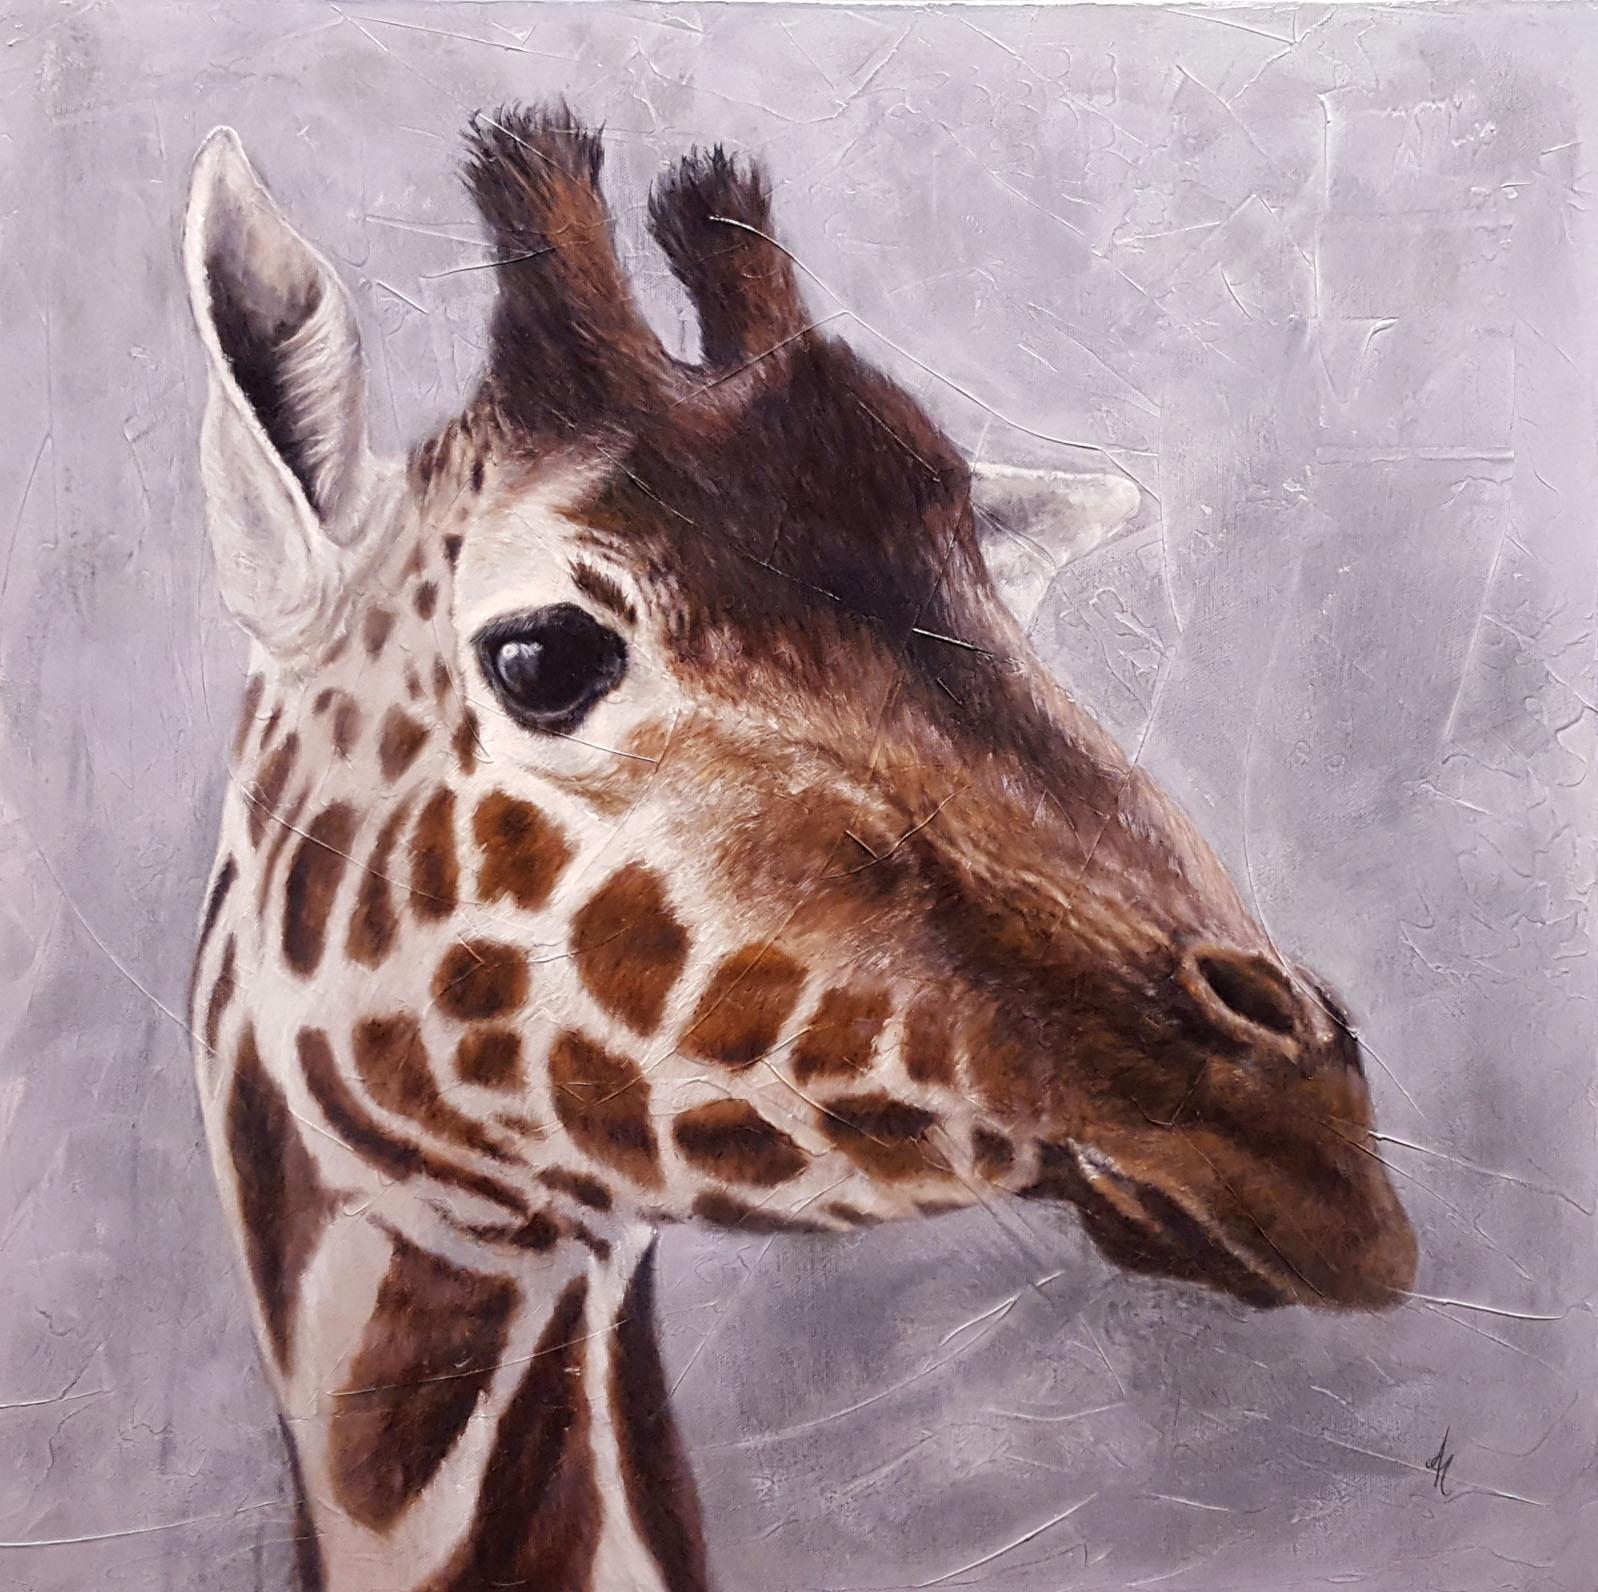 """Giraffe"" by Andrea Hennings"